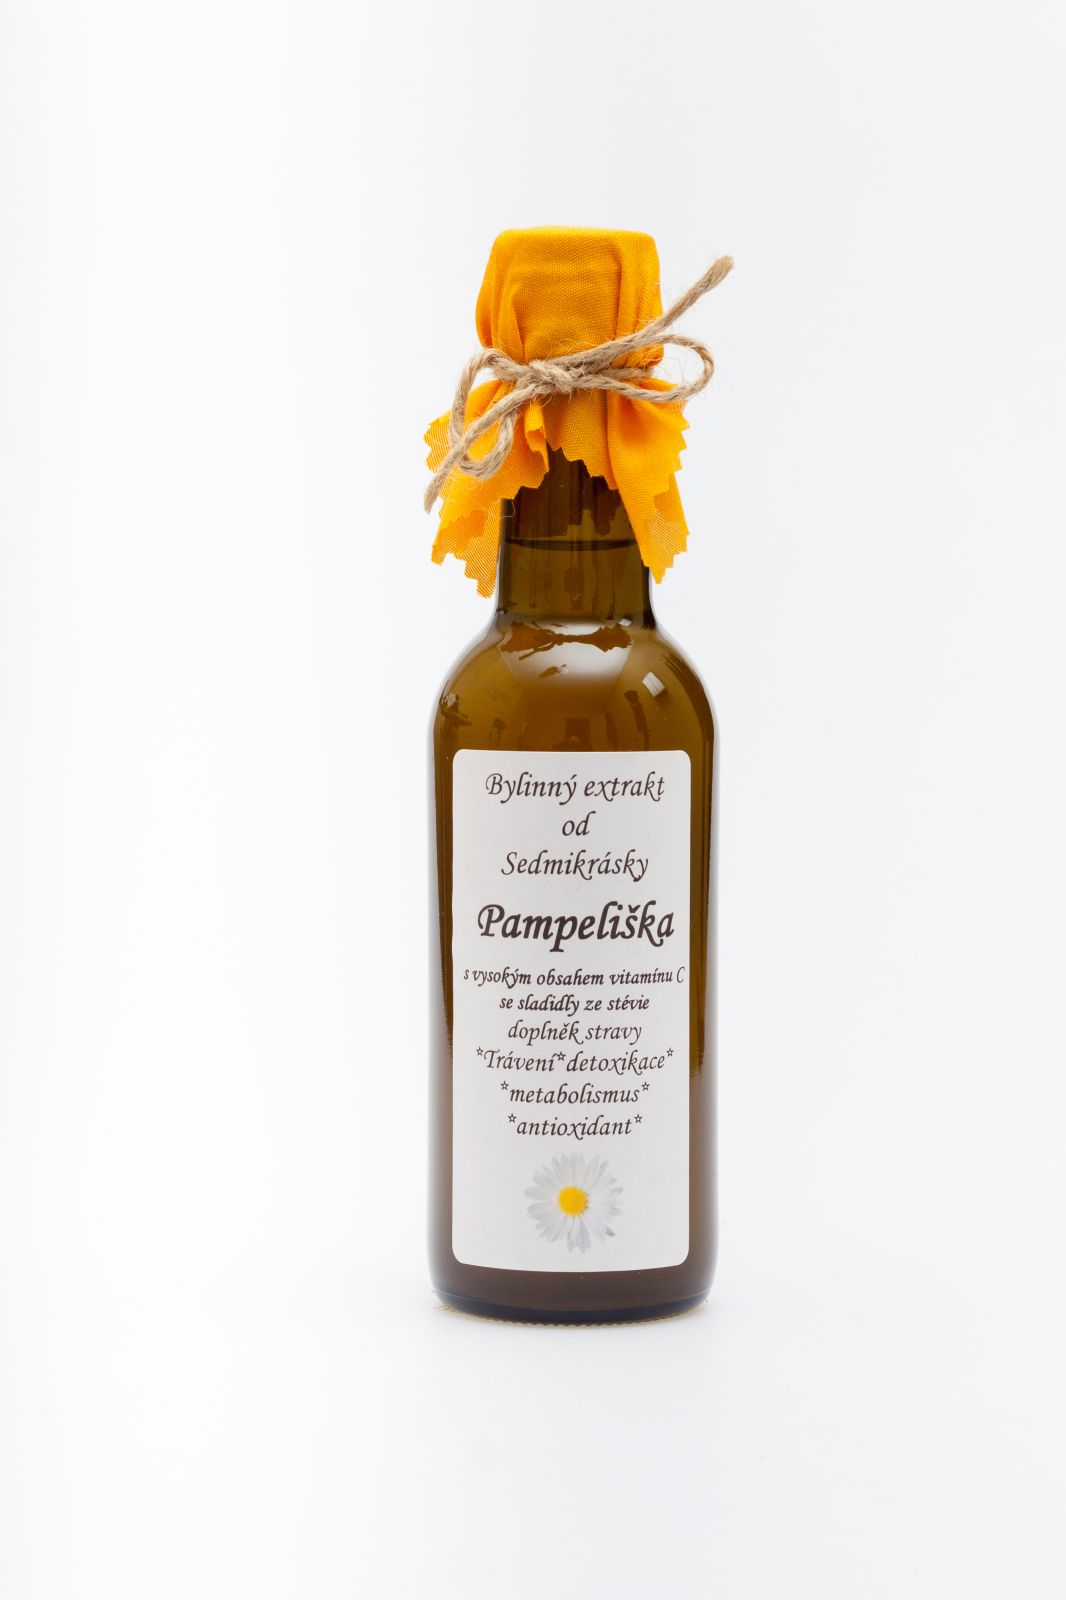 Sedmikráska ekstrakt ziołowy Mniszek lekarski 250ml trávení, energetický metabolismus, detoxikace, antioxidant doplněk stravy Rodinná farma Sedmikráska